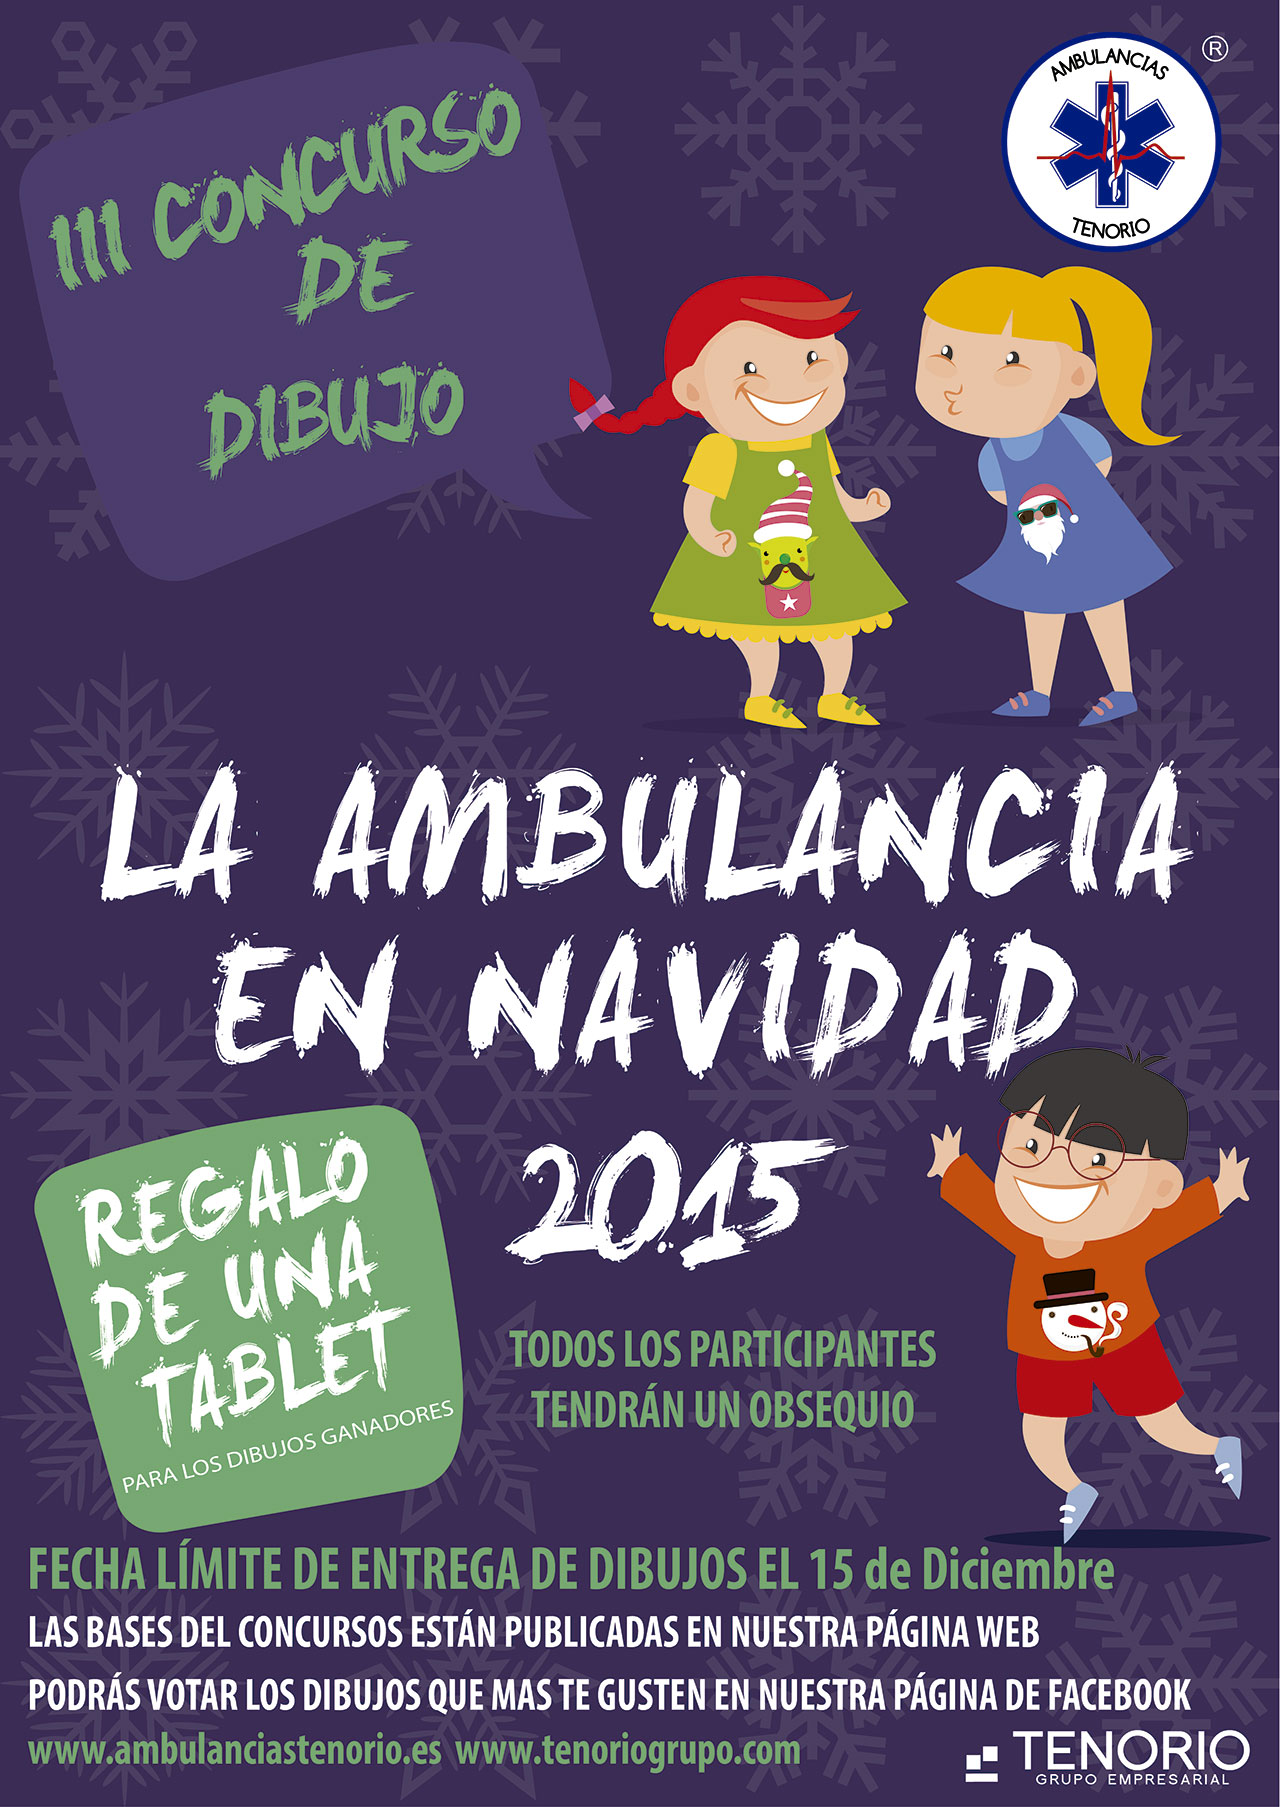 "III Concurso de Dibujo Infantil de Grupo Tenorio ""La Ambulancia en Navidad"""